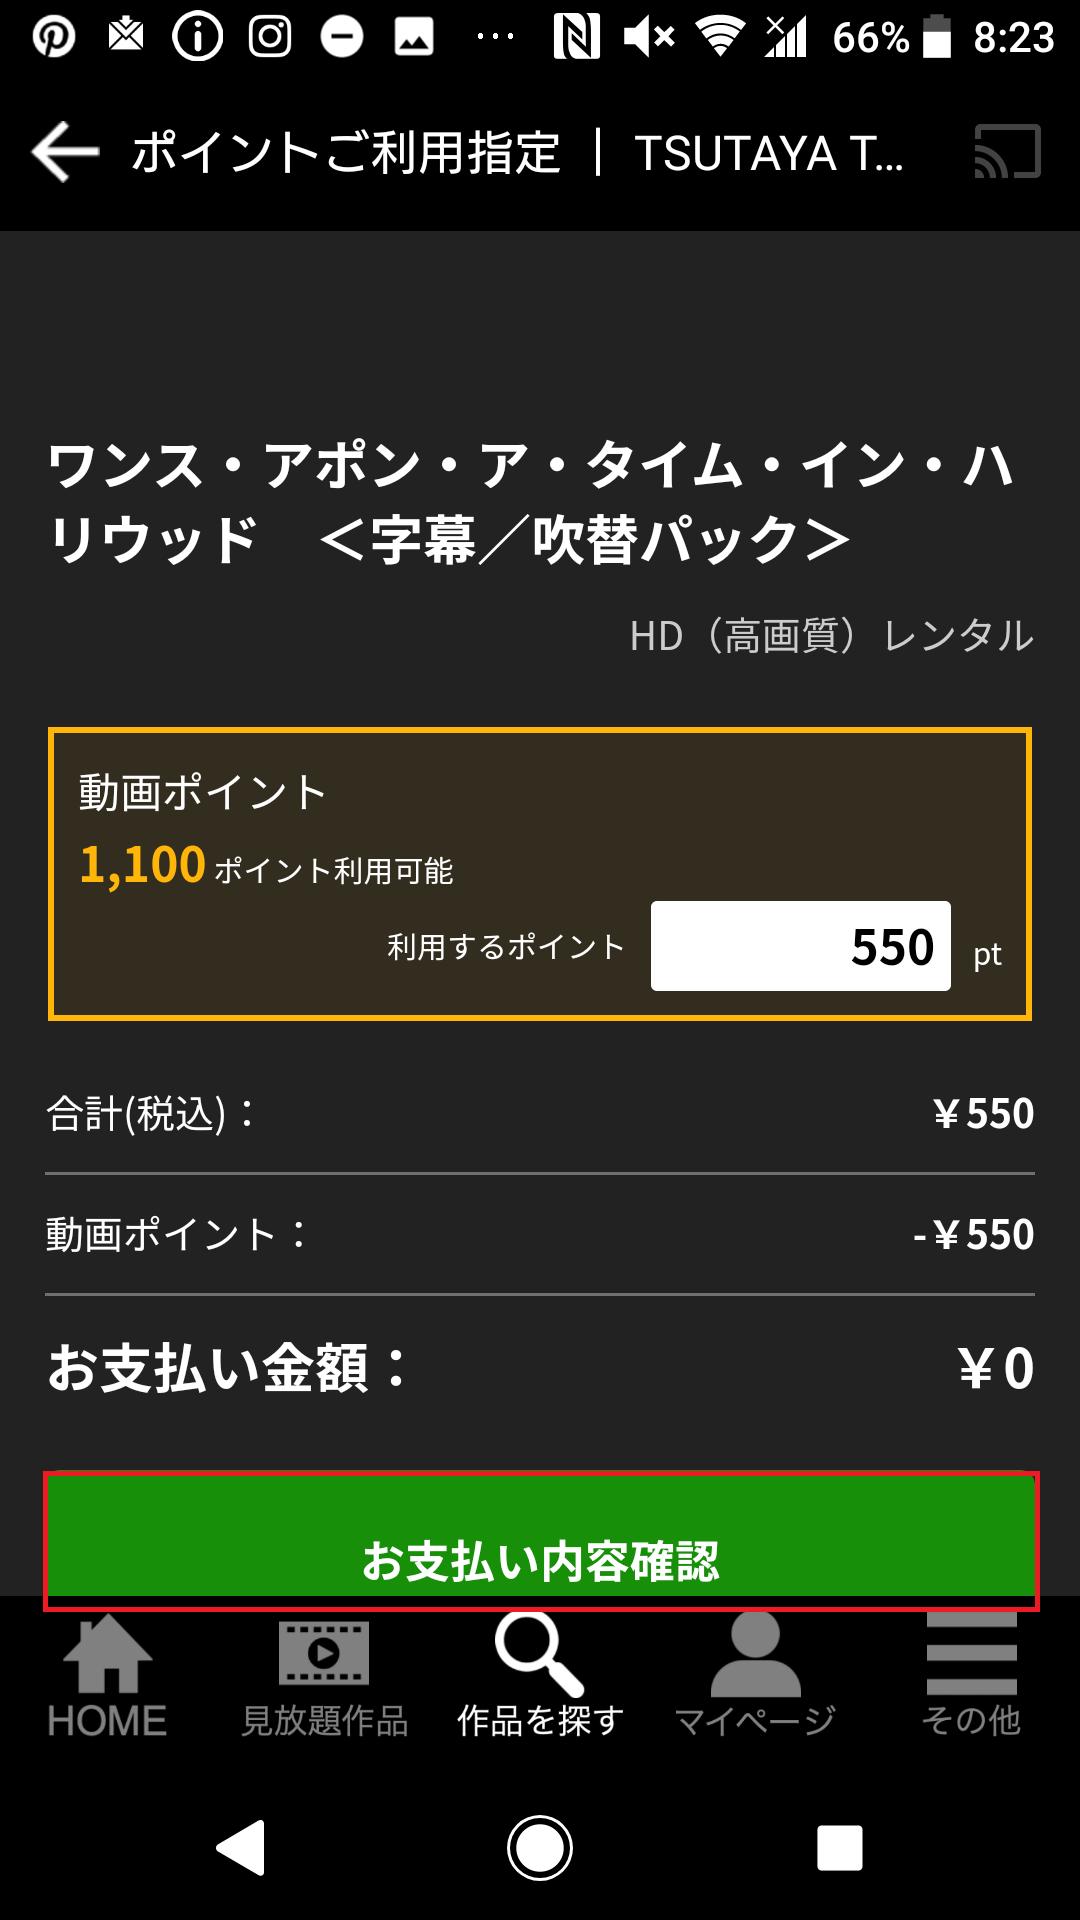 TSUTAYA TV(ツタヤティービー)ポイントで映画レンタル方法手順の画像_8